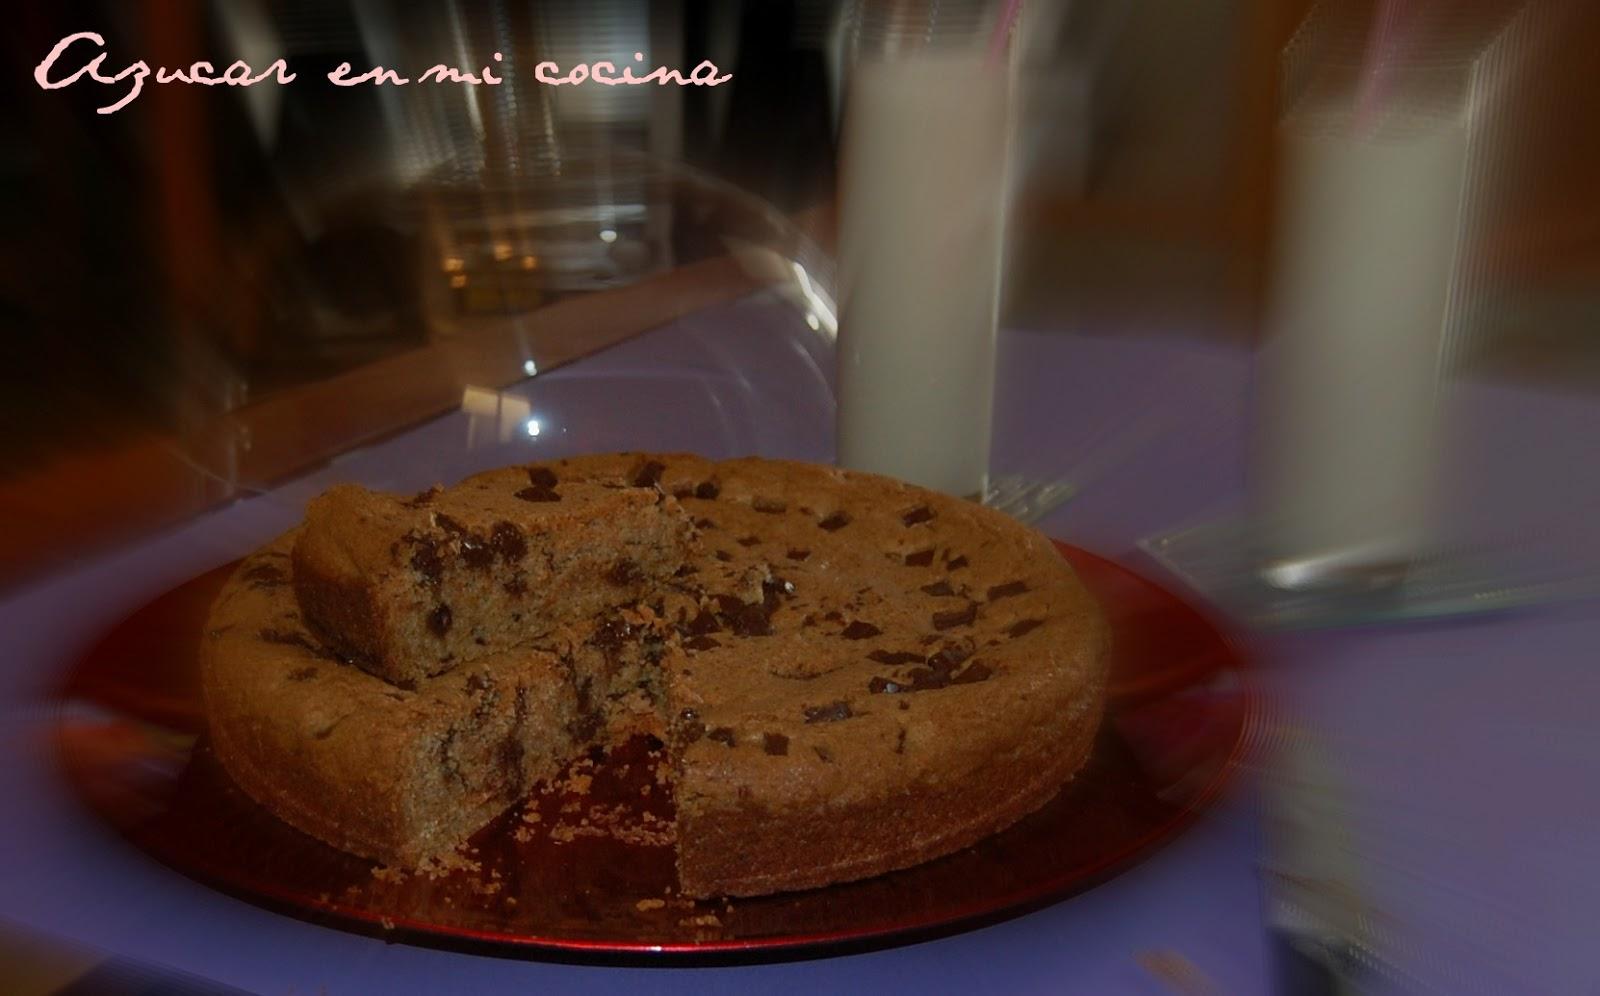 http://azucarenmicocina.blogspot.com.es/2013/07/spss-receta-robada-super-cookie-chip.html